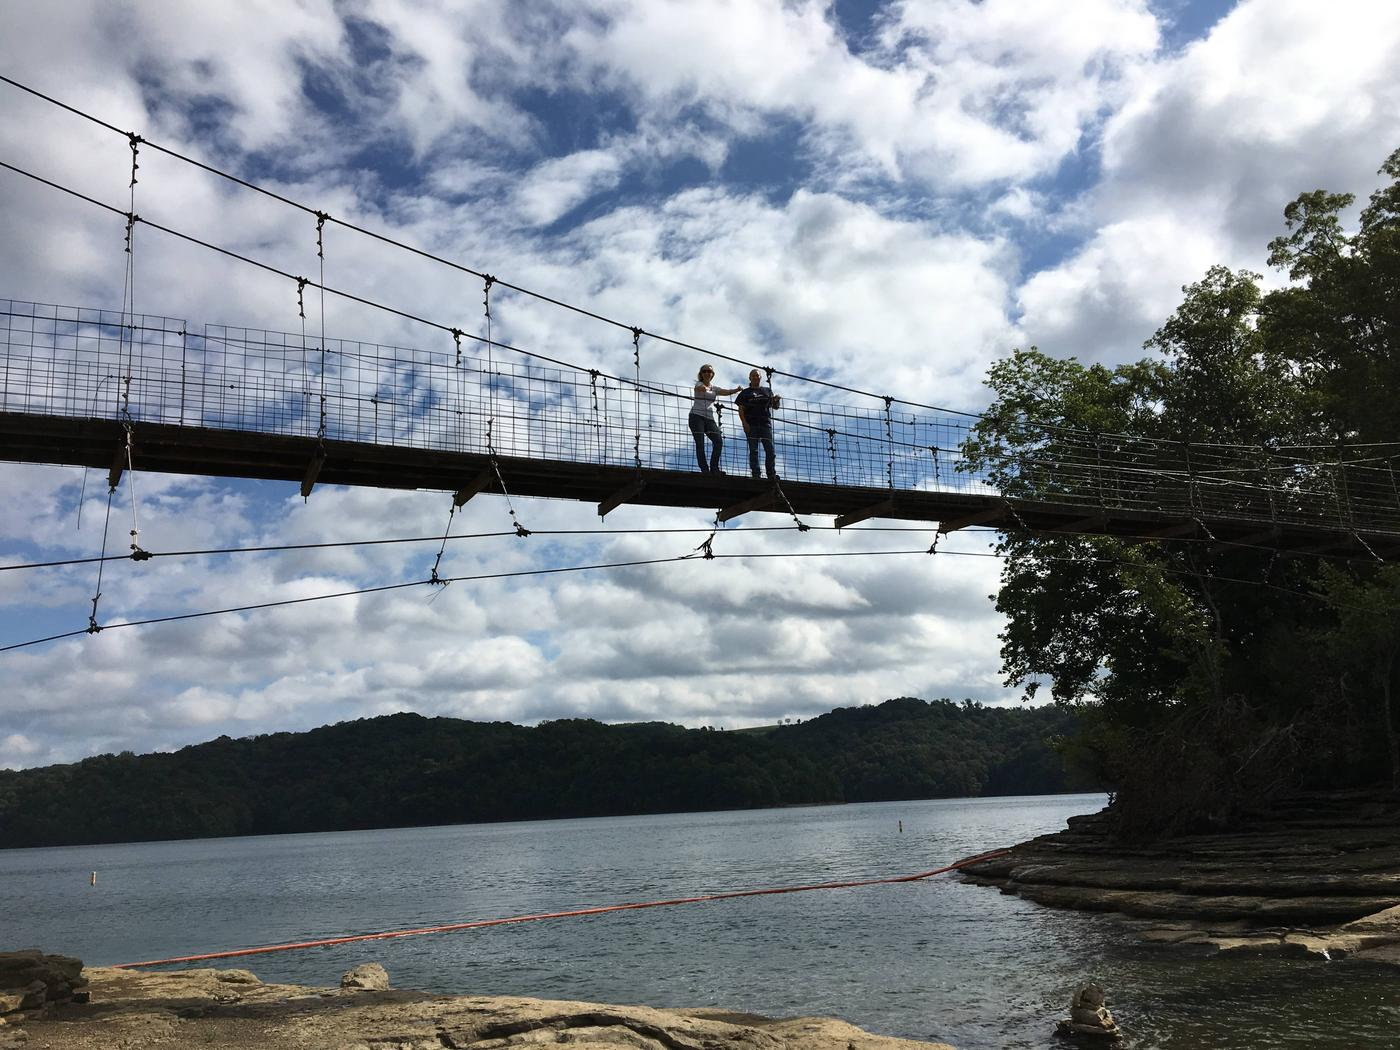 PLEASANT GROVE DAY USE SWINGING BRIDGE VIEW FROM LAKE SHOREPLEASANT GROVE DAY USE